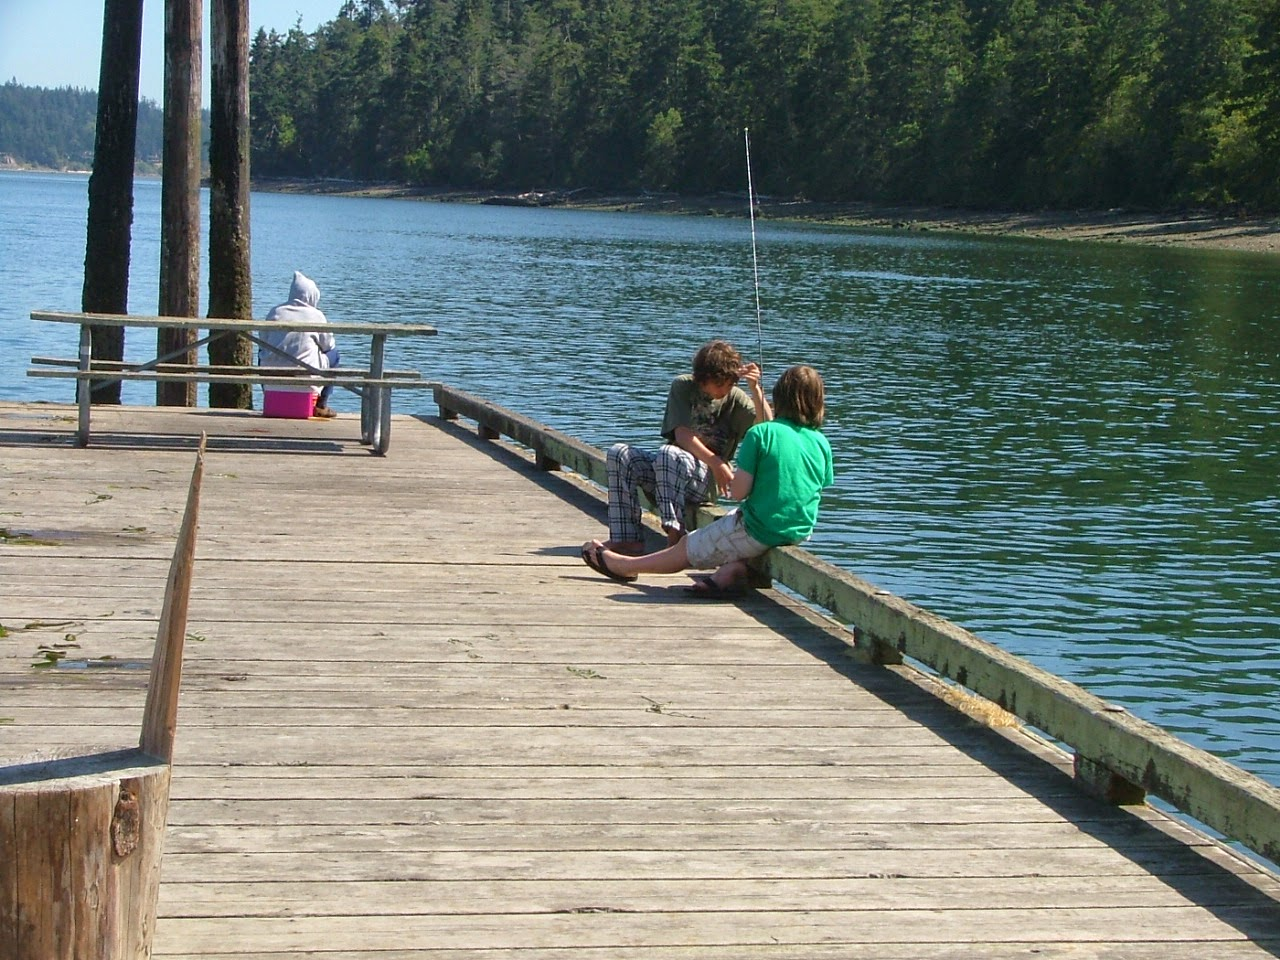 Cornet Bay fishing dock at Deception Pass Park